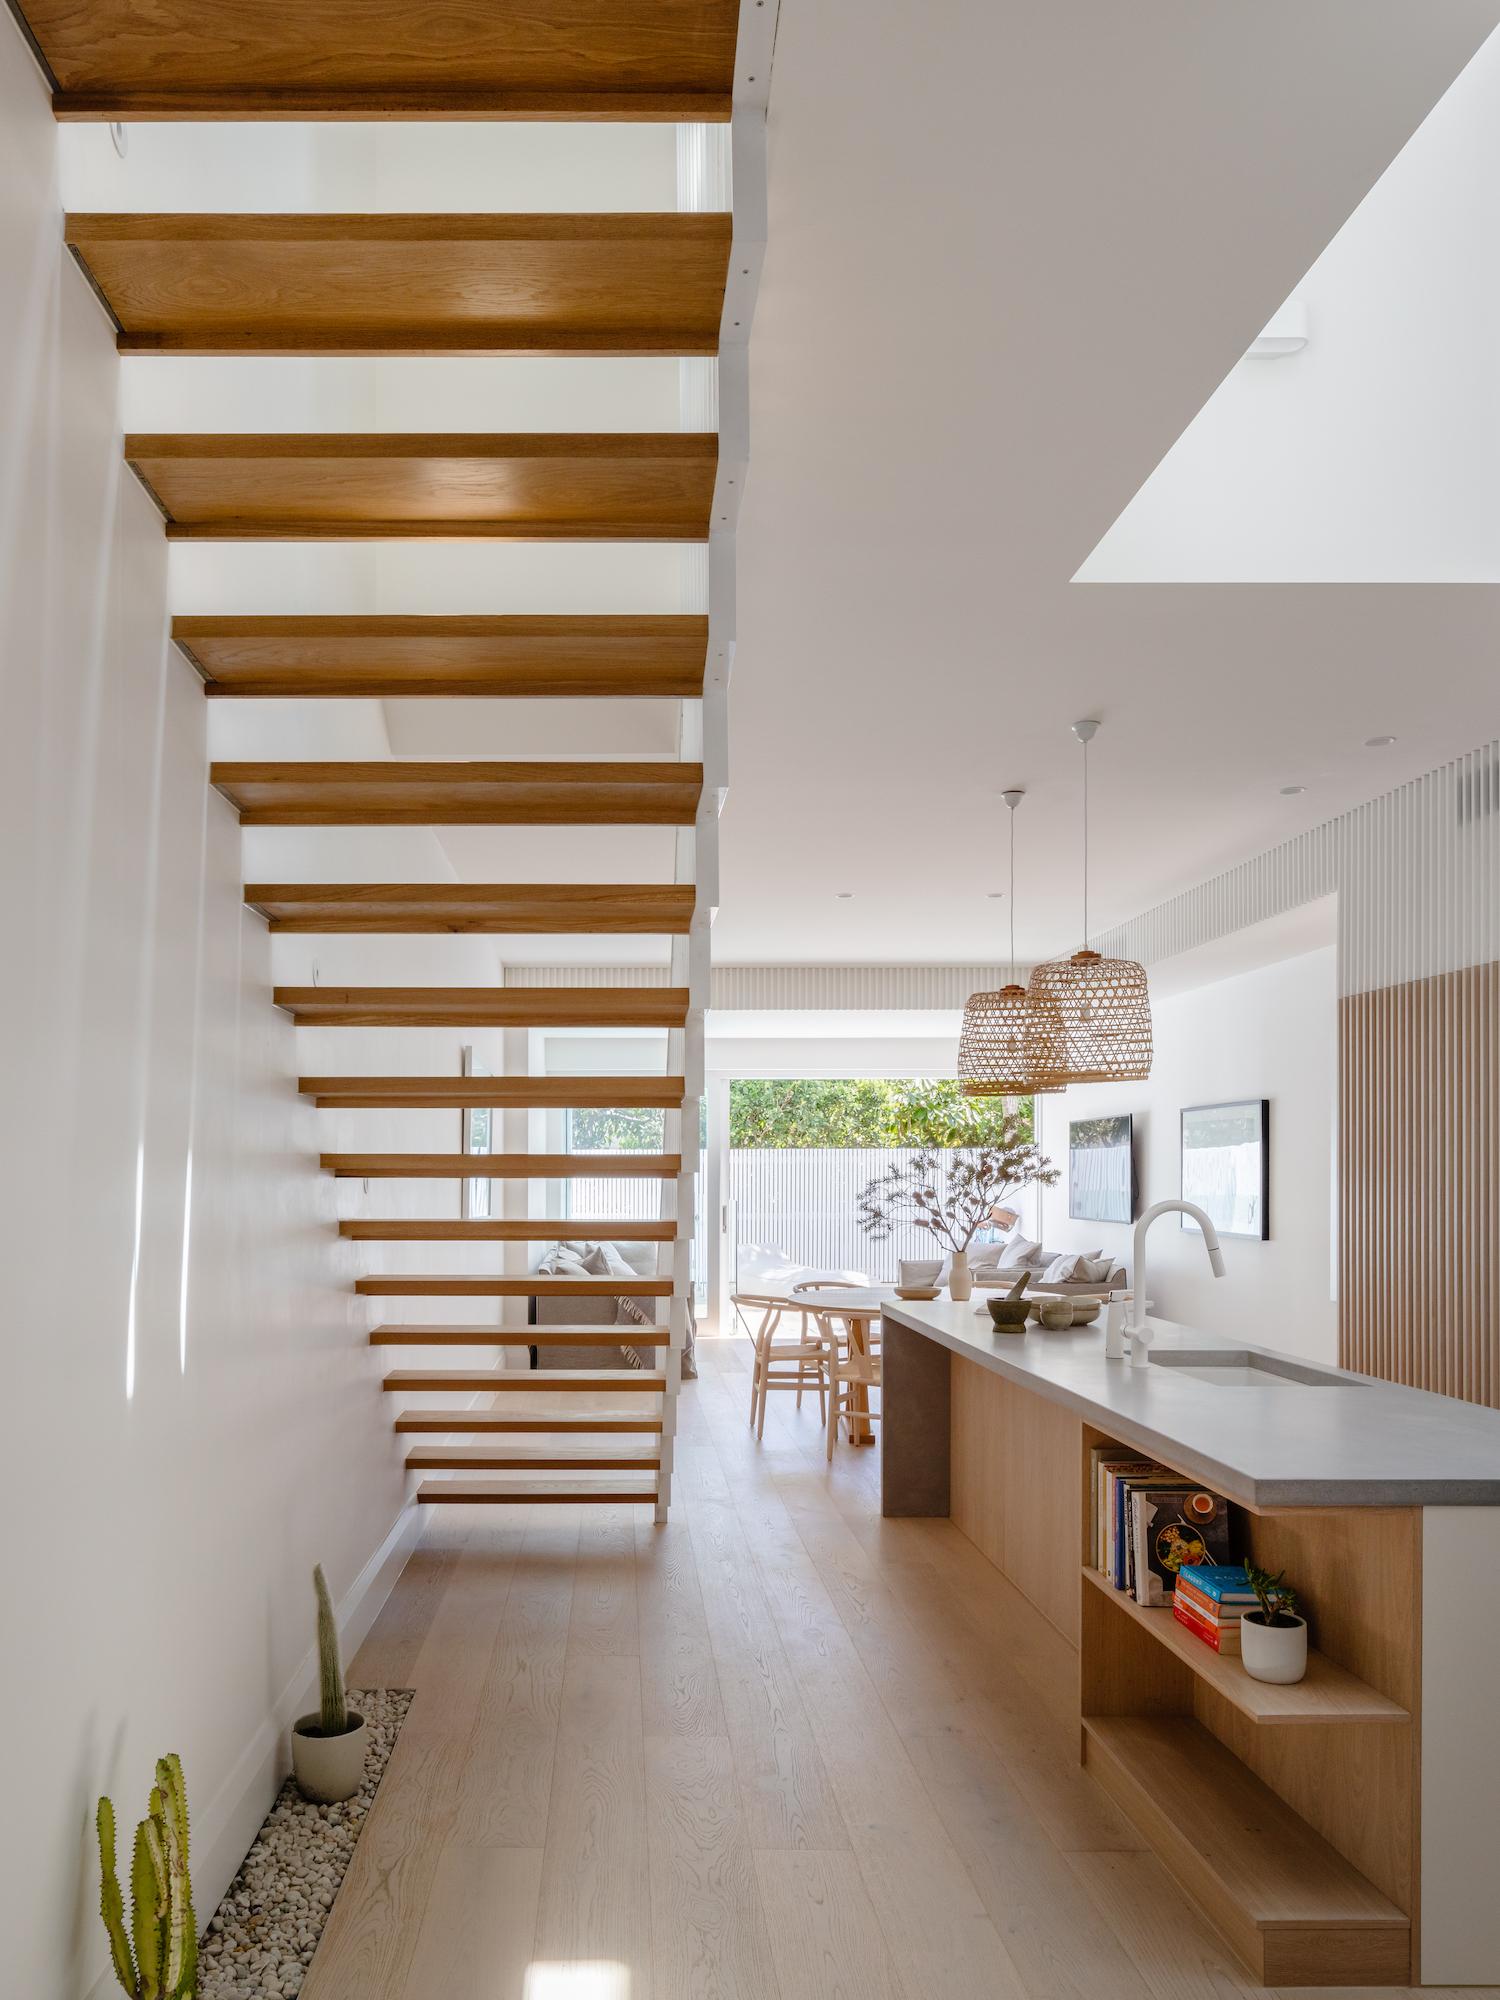 North Bondi House by James Garvin Architecture